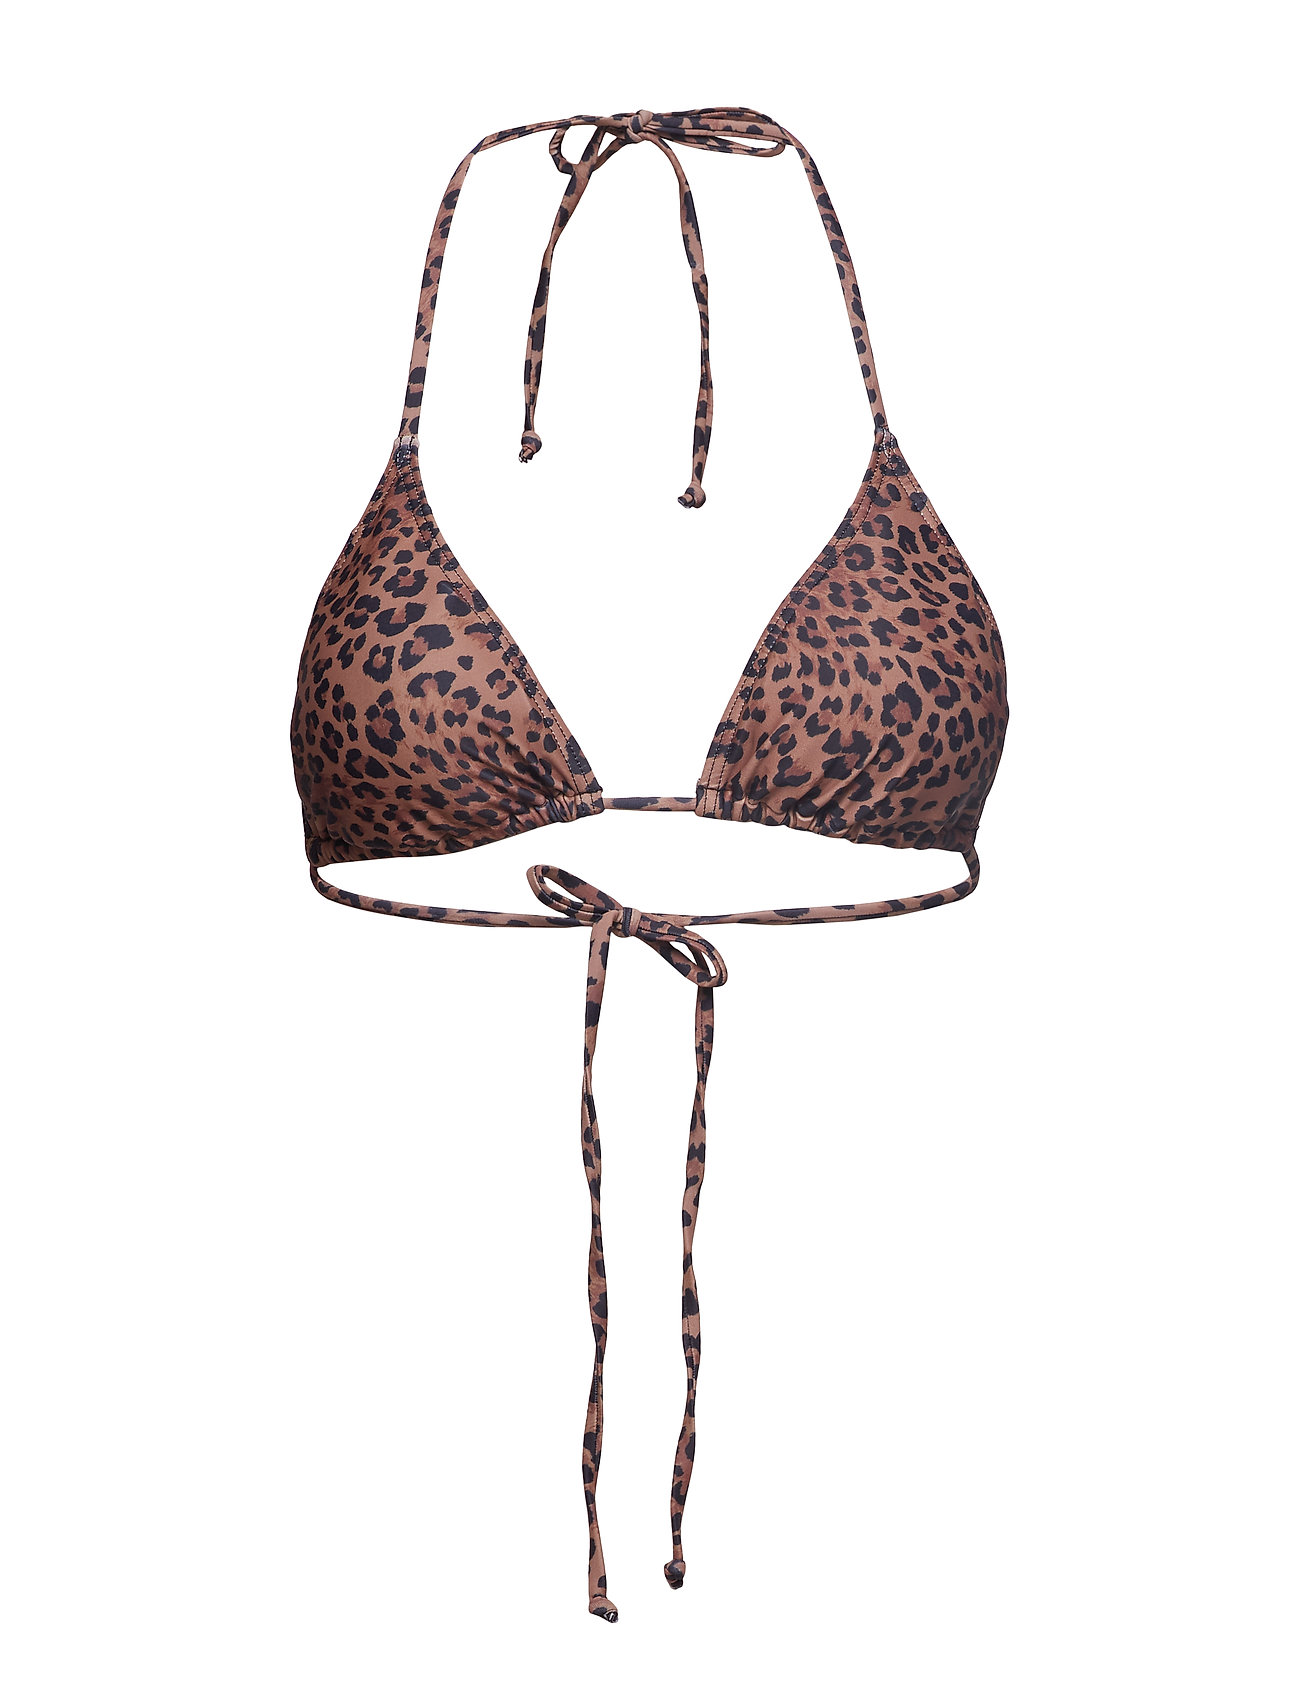 85f492a5e4e Pilgz Bikini Top Hs19 Bikinitop Brun GESTUZ